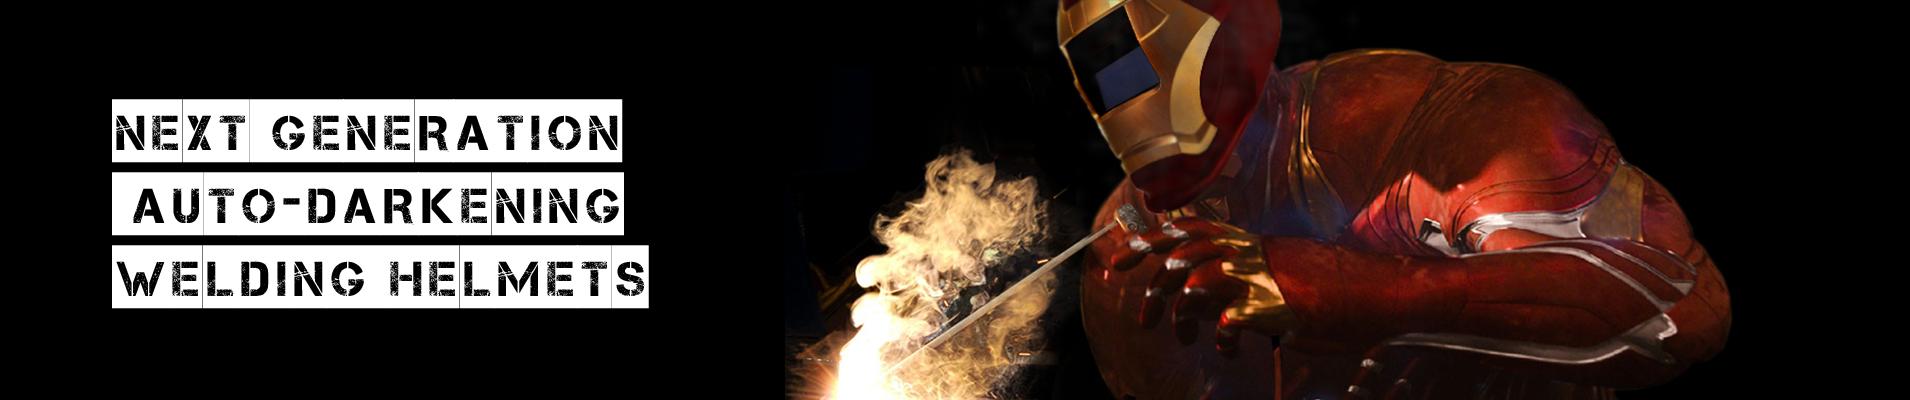 Iron Man inspired auto-darkening welding mask